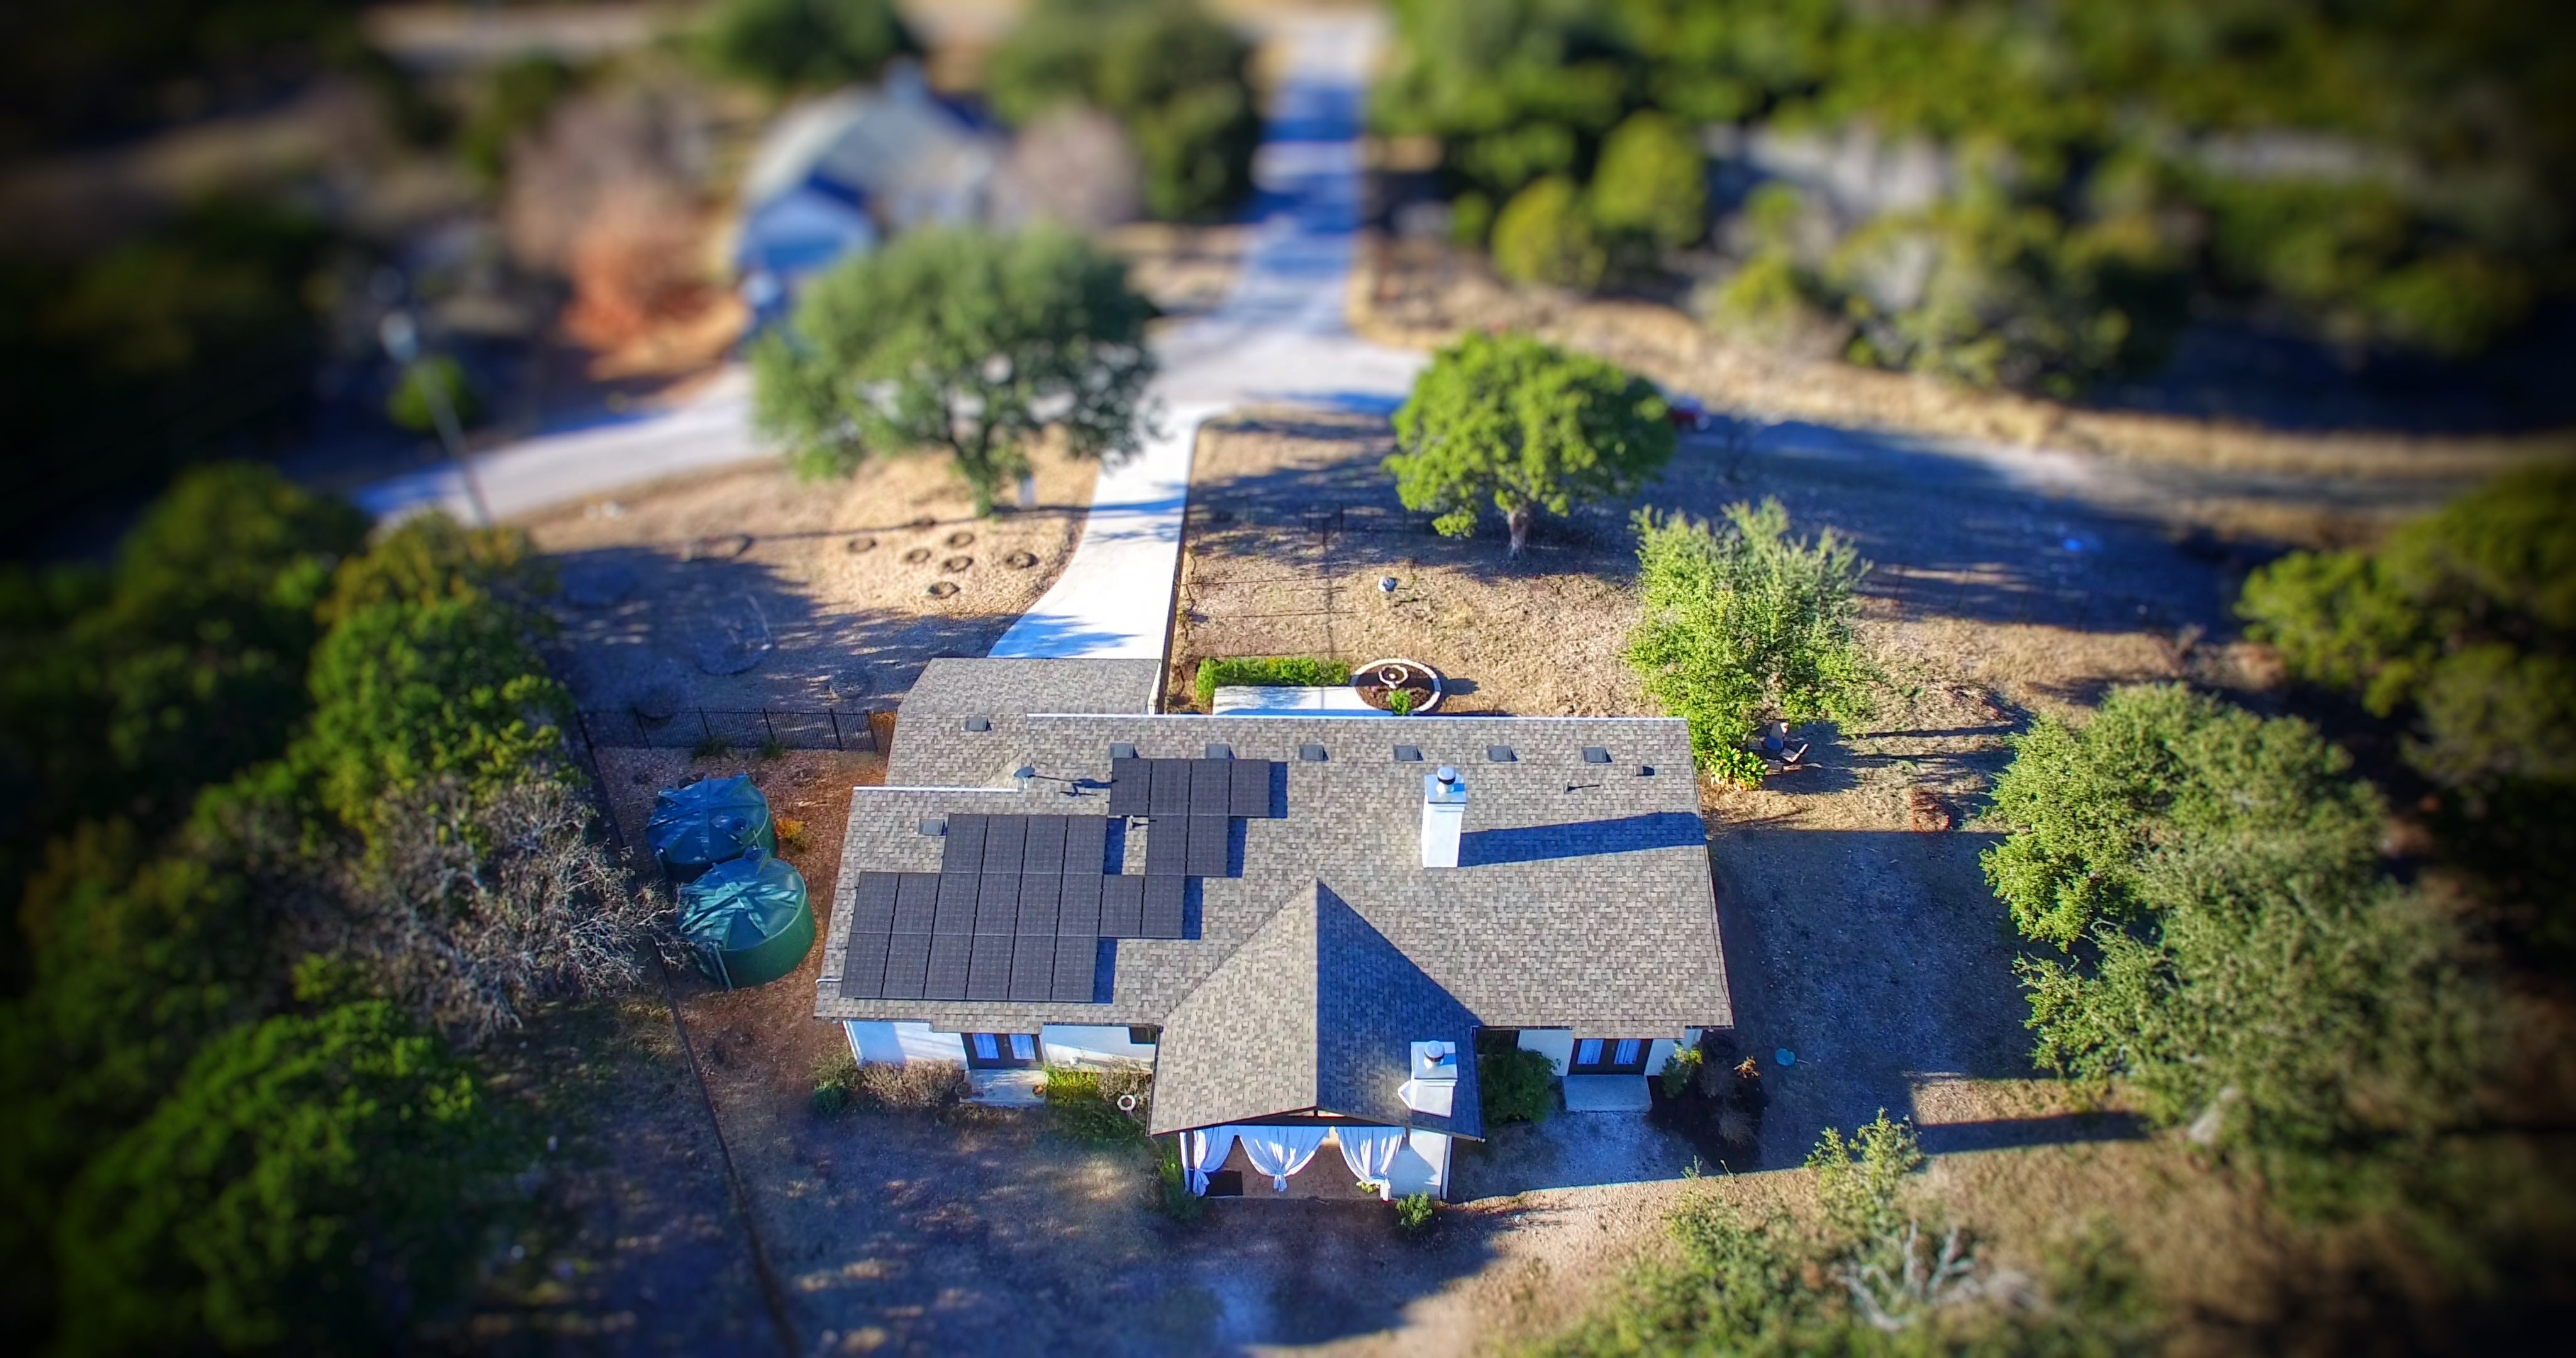 Residential Rooftop Solar Array Horseshoe Bay, Texas